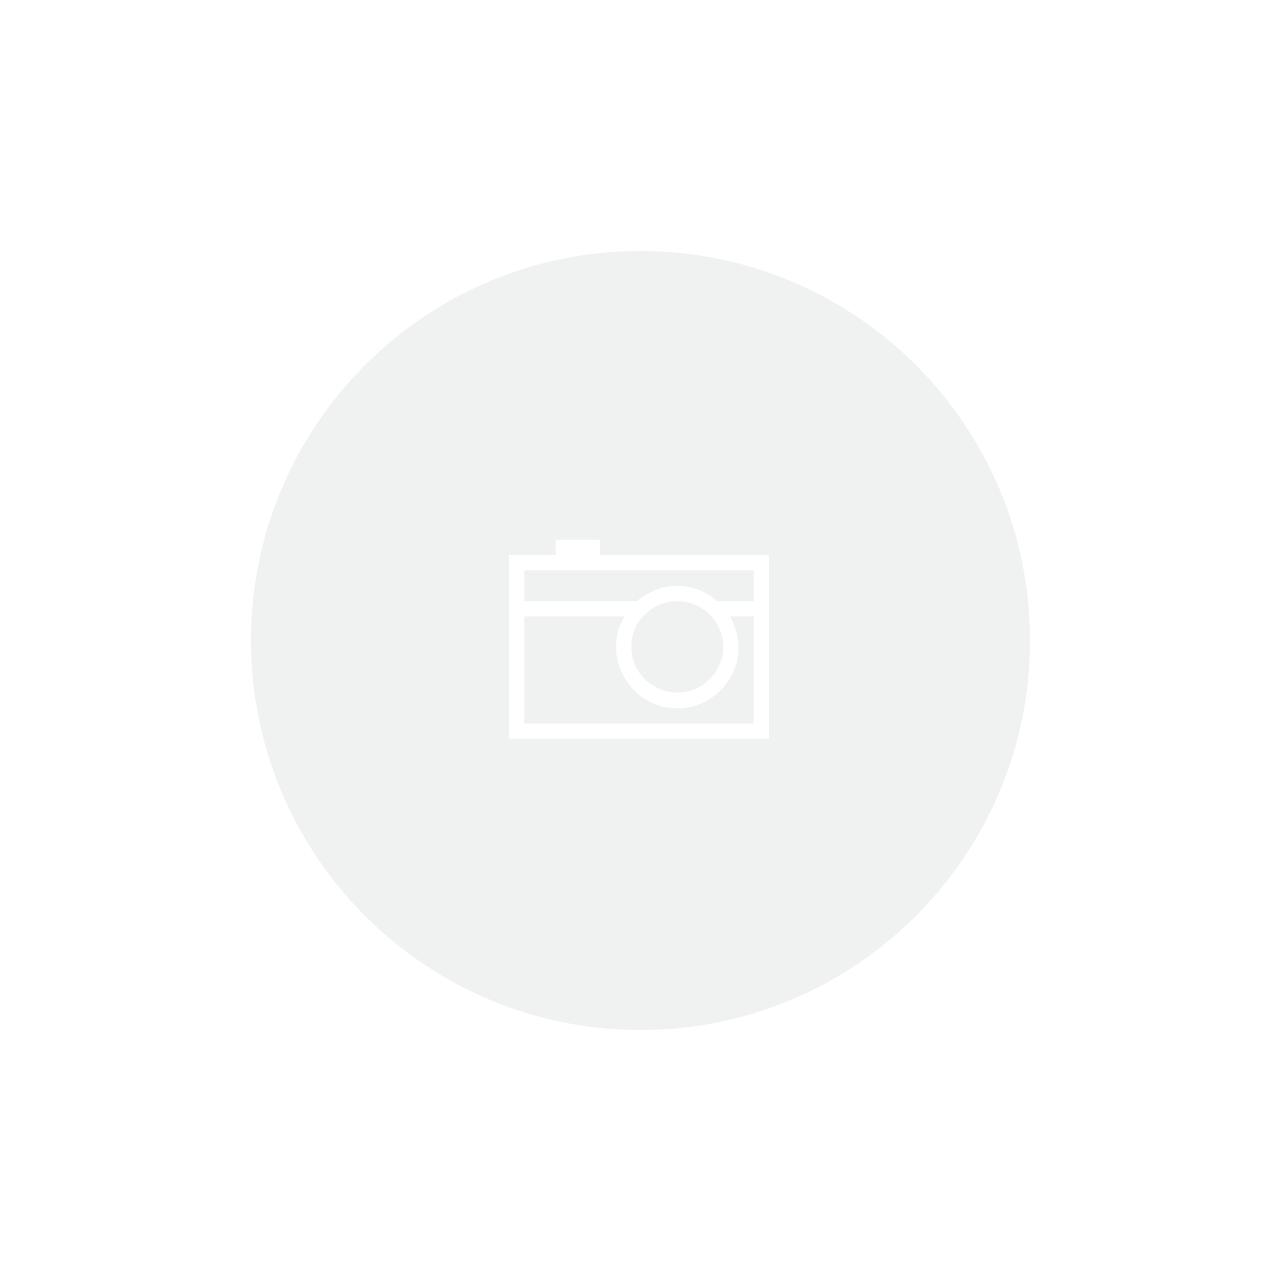 CHAVE ALLEN PARK TOOL AWS-1 C/ 3 PONTAS (4/5/6mm)